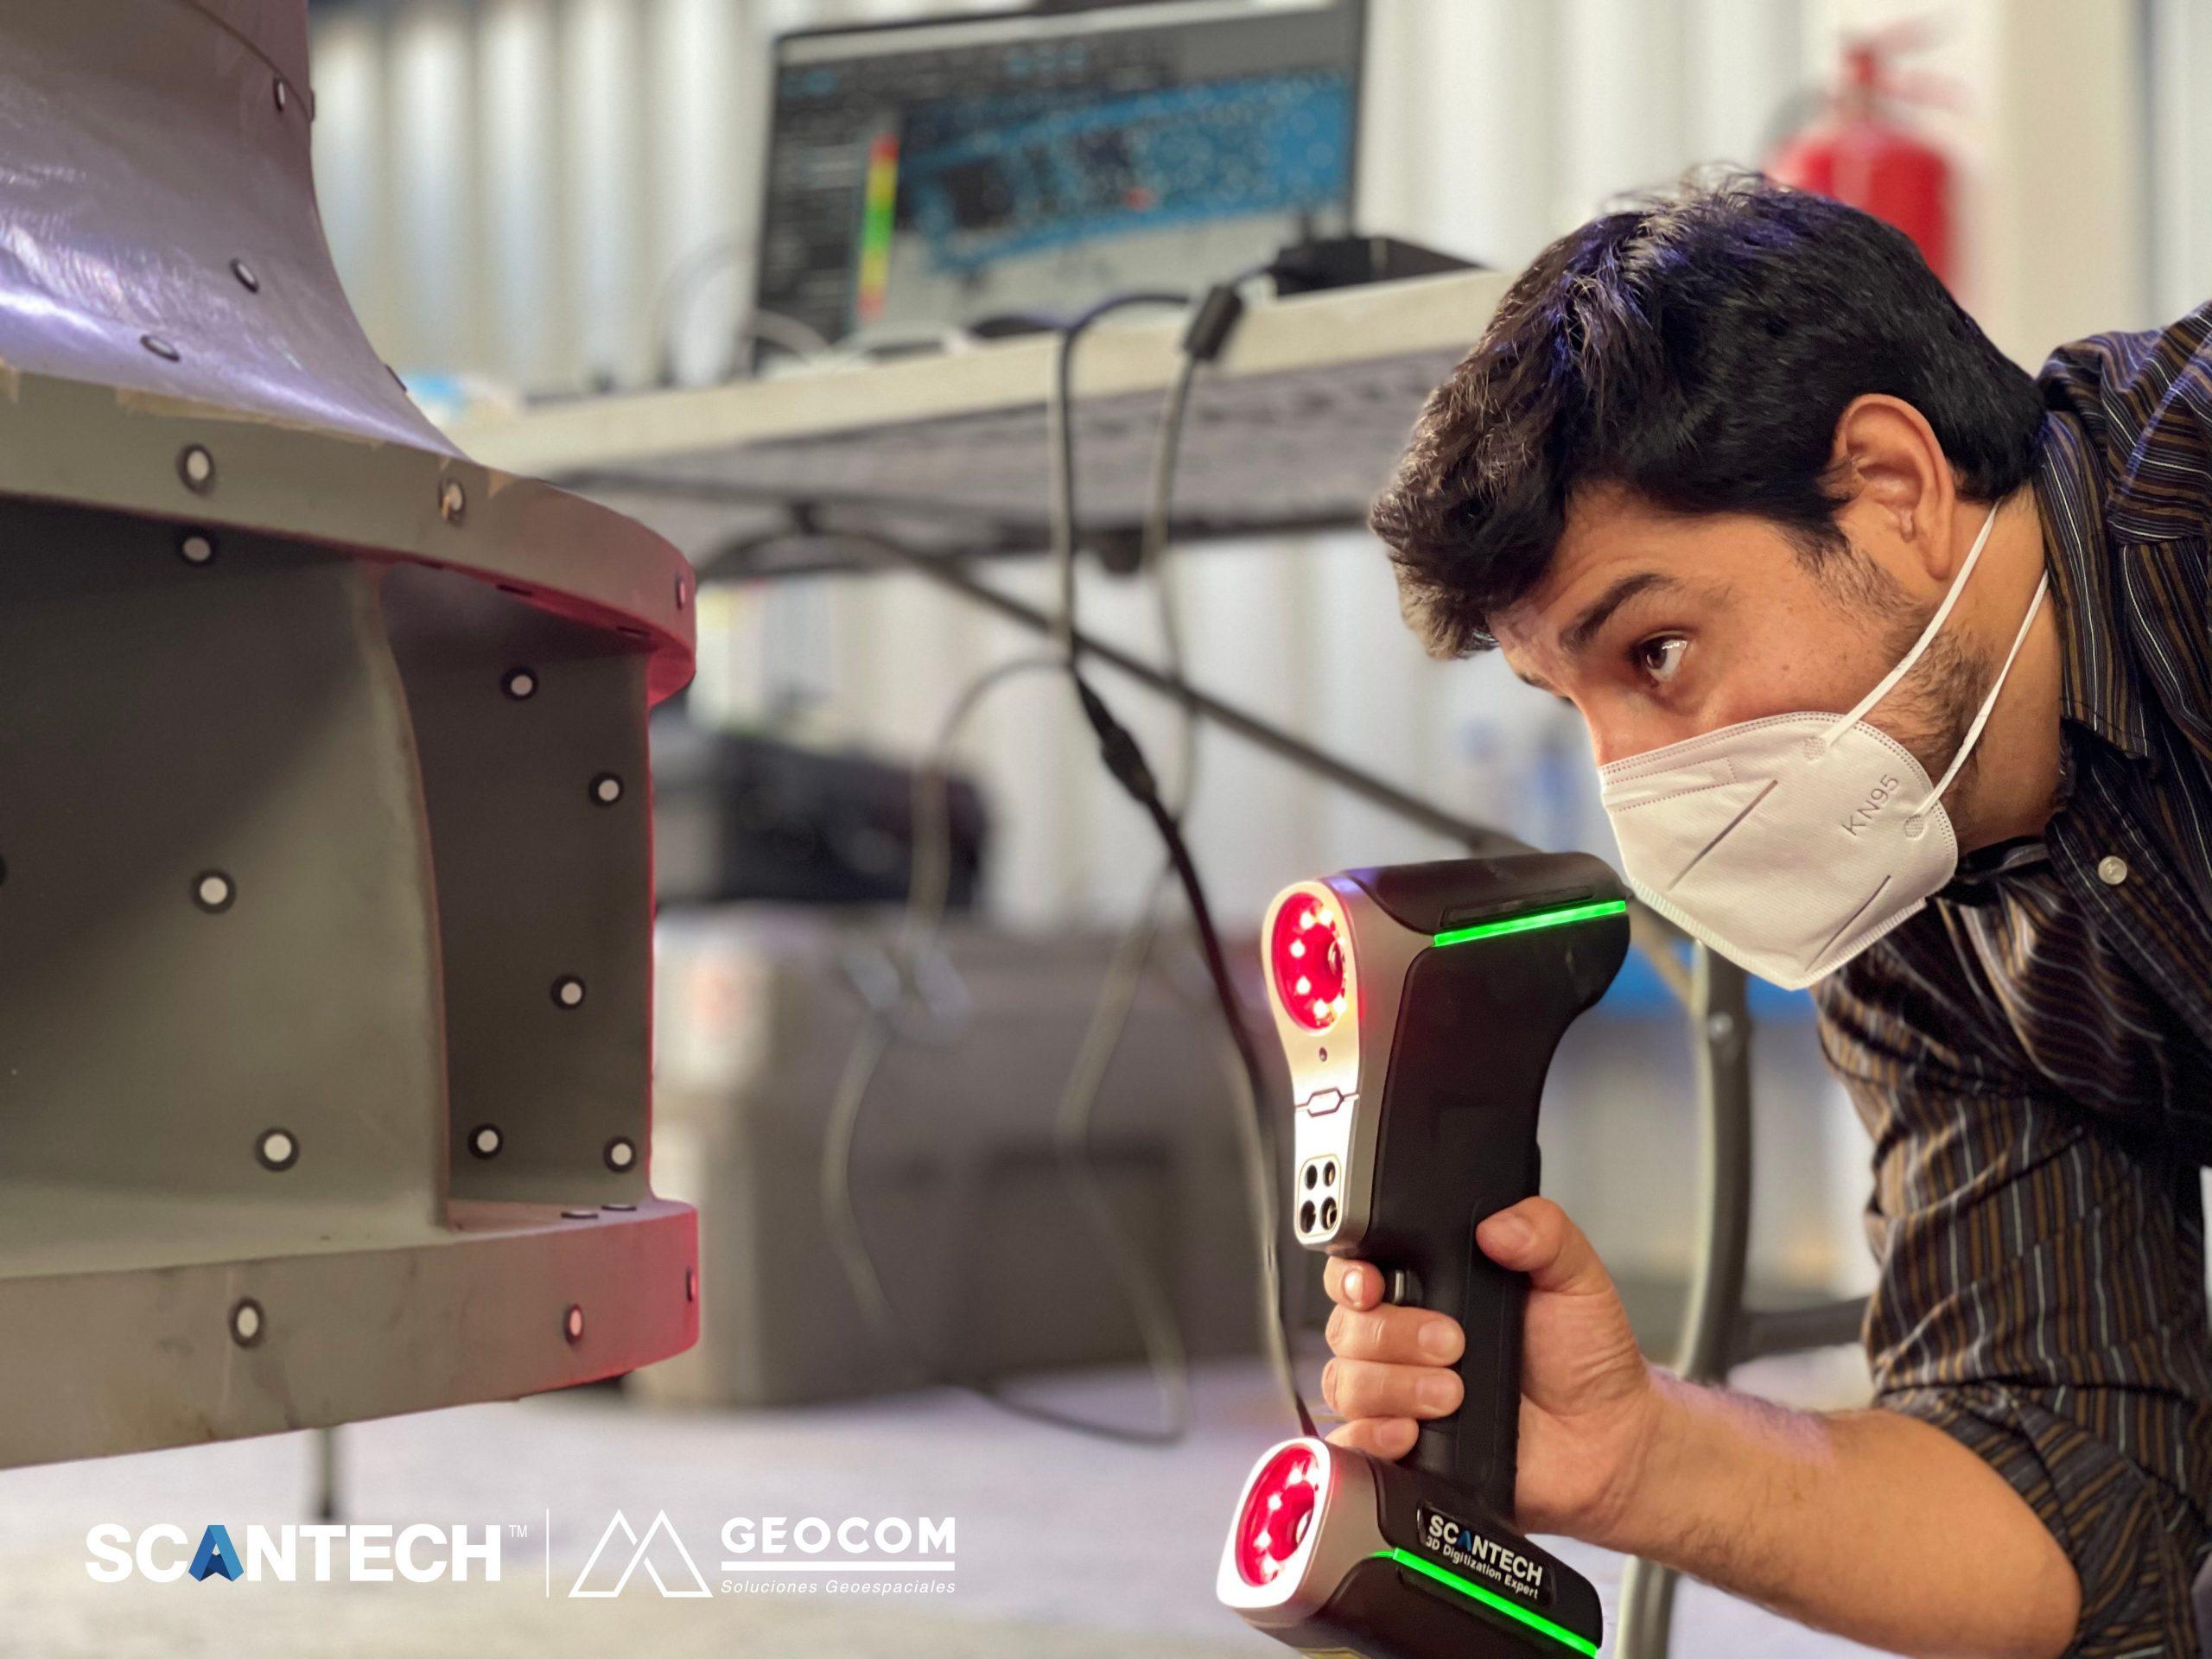 turbine reverse transformation case from the Chilean company GEOCOM